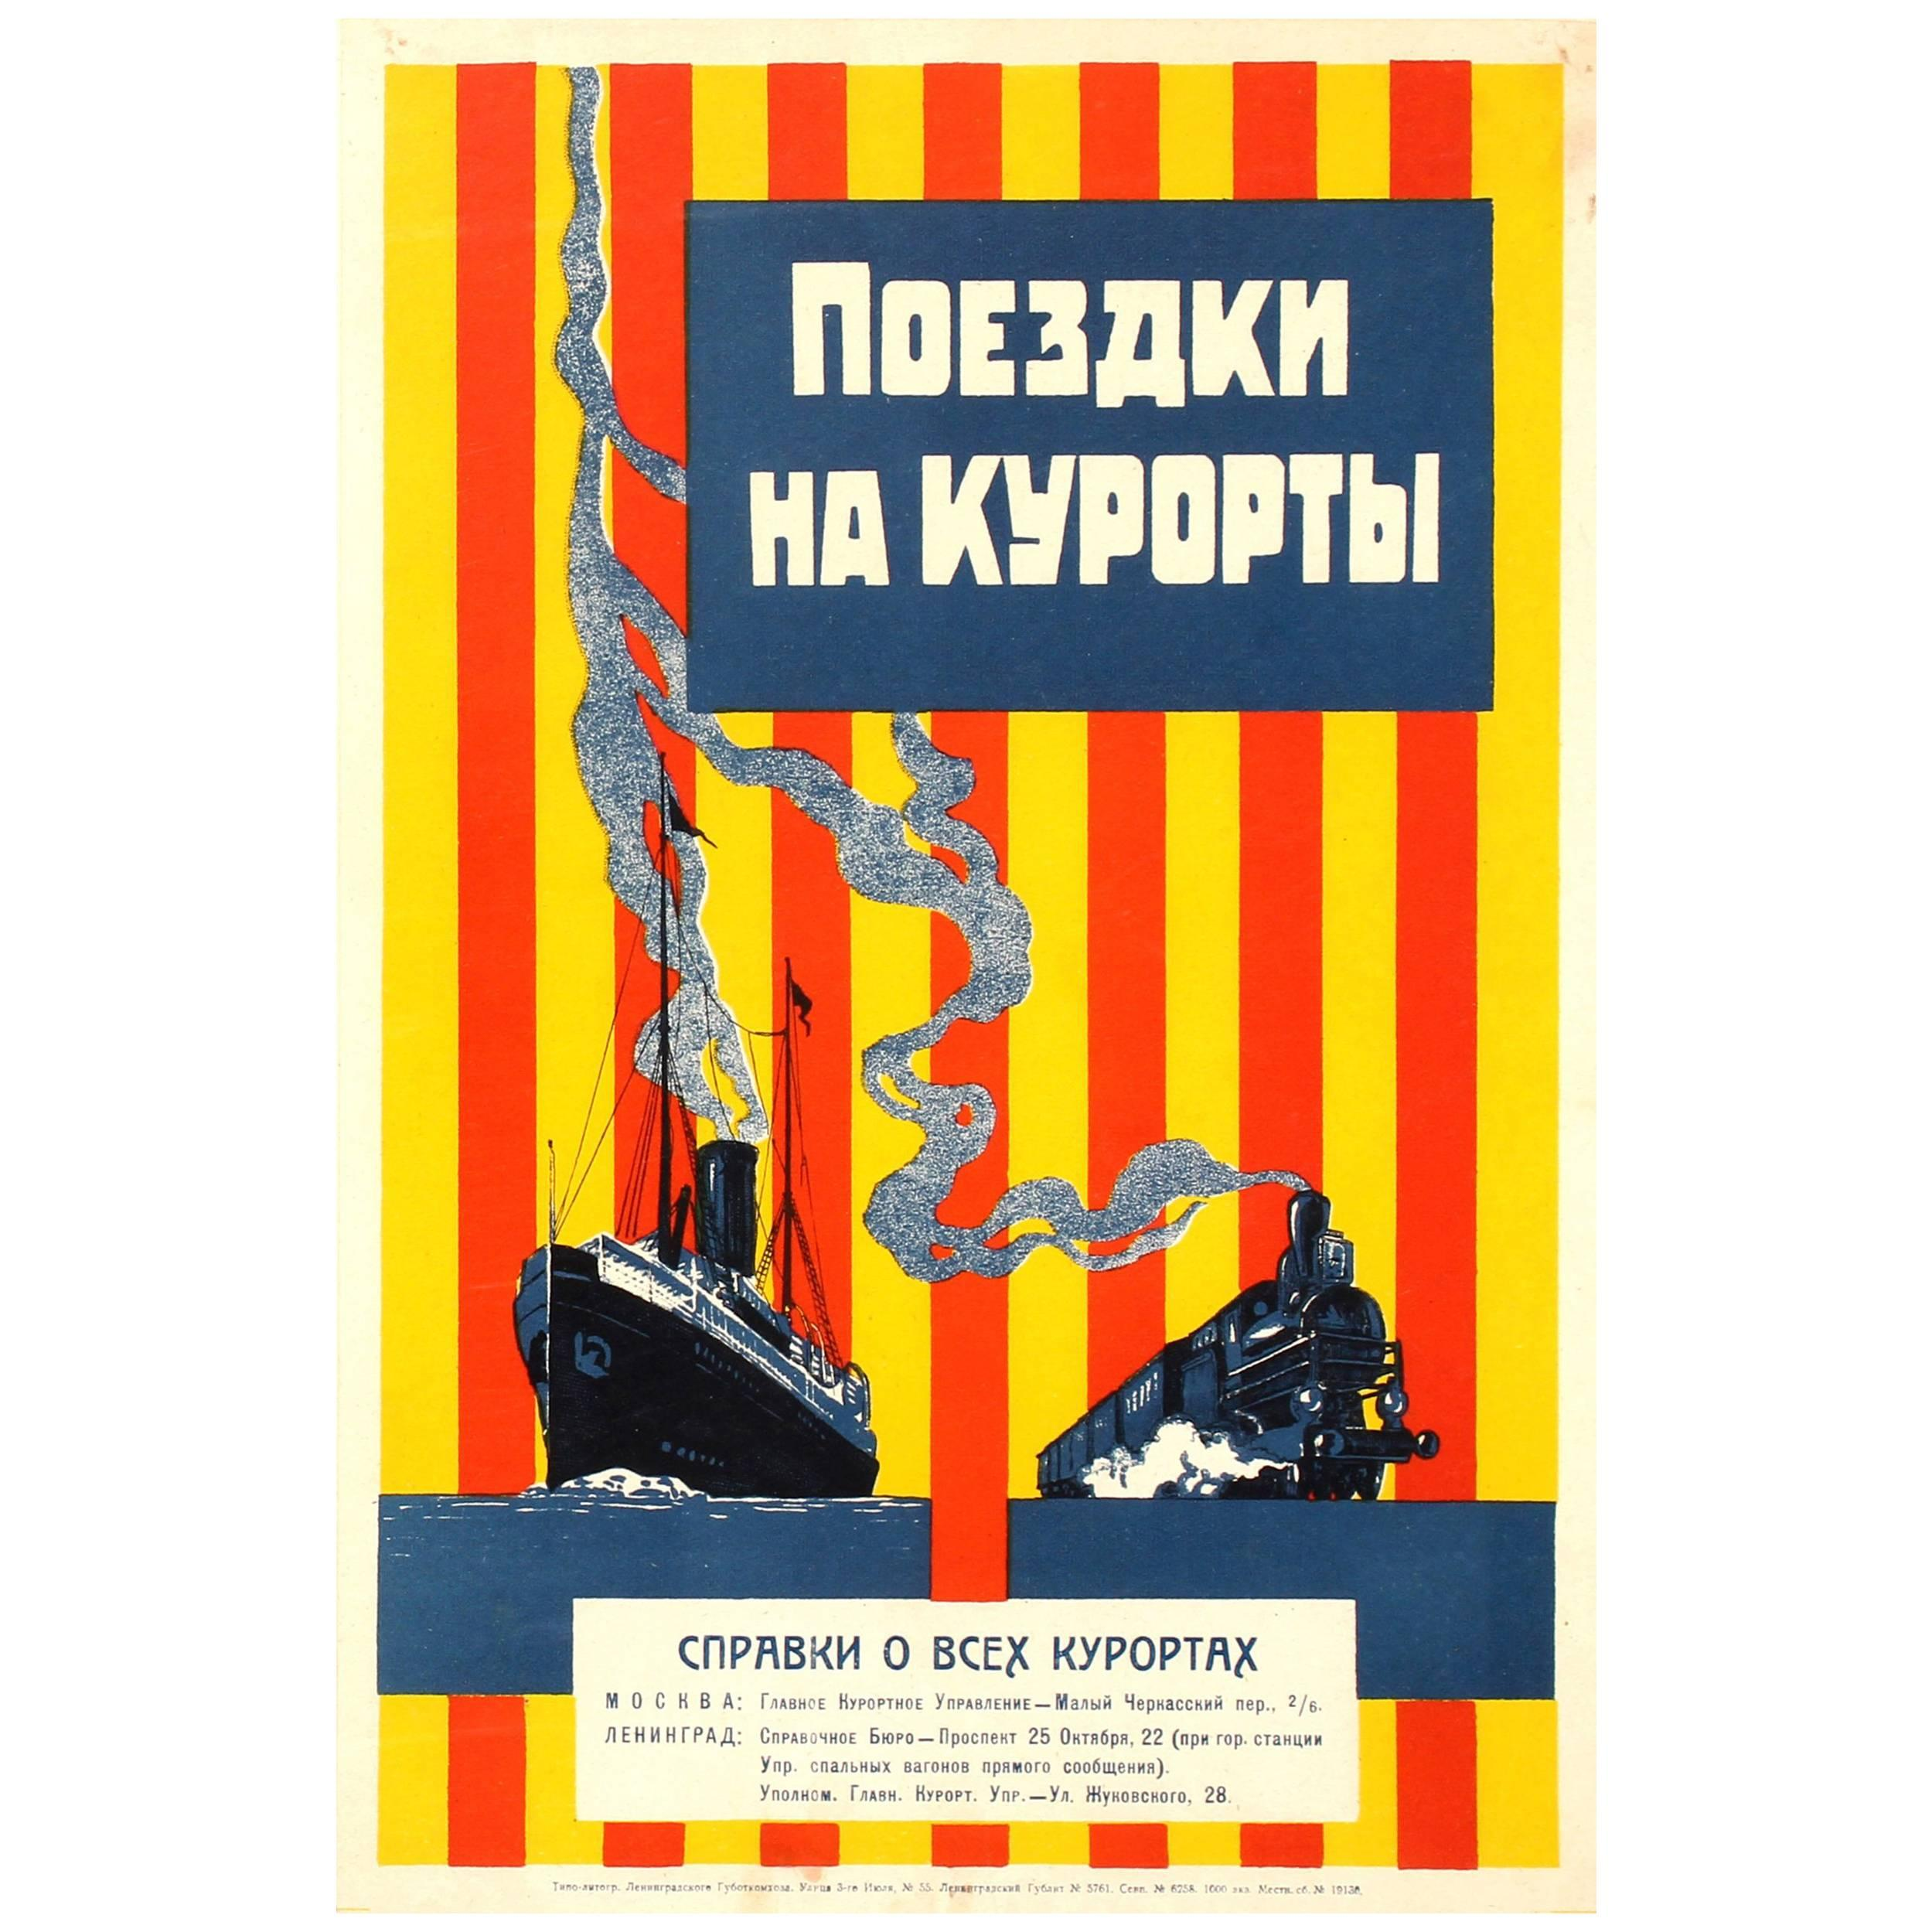 Original Early Soviet NEP Era Constructivist Design Poster Trips to Resorts USSR